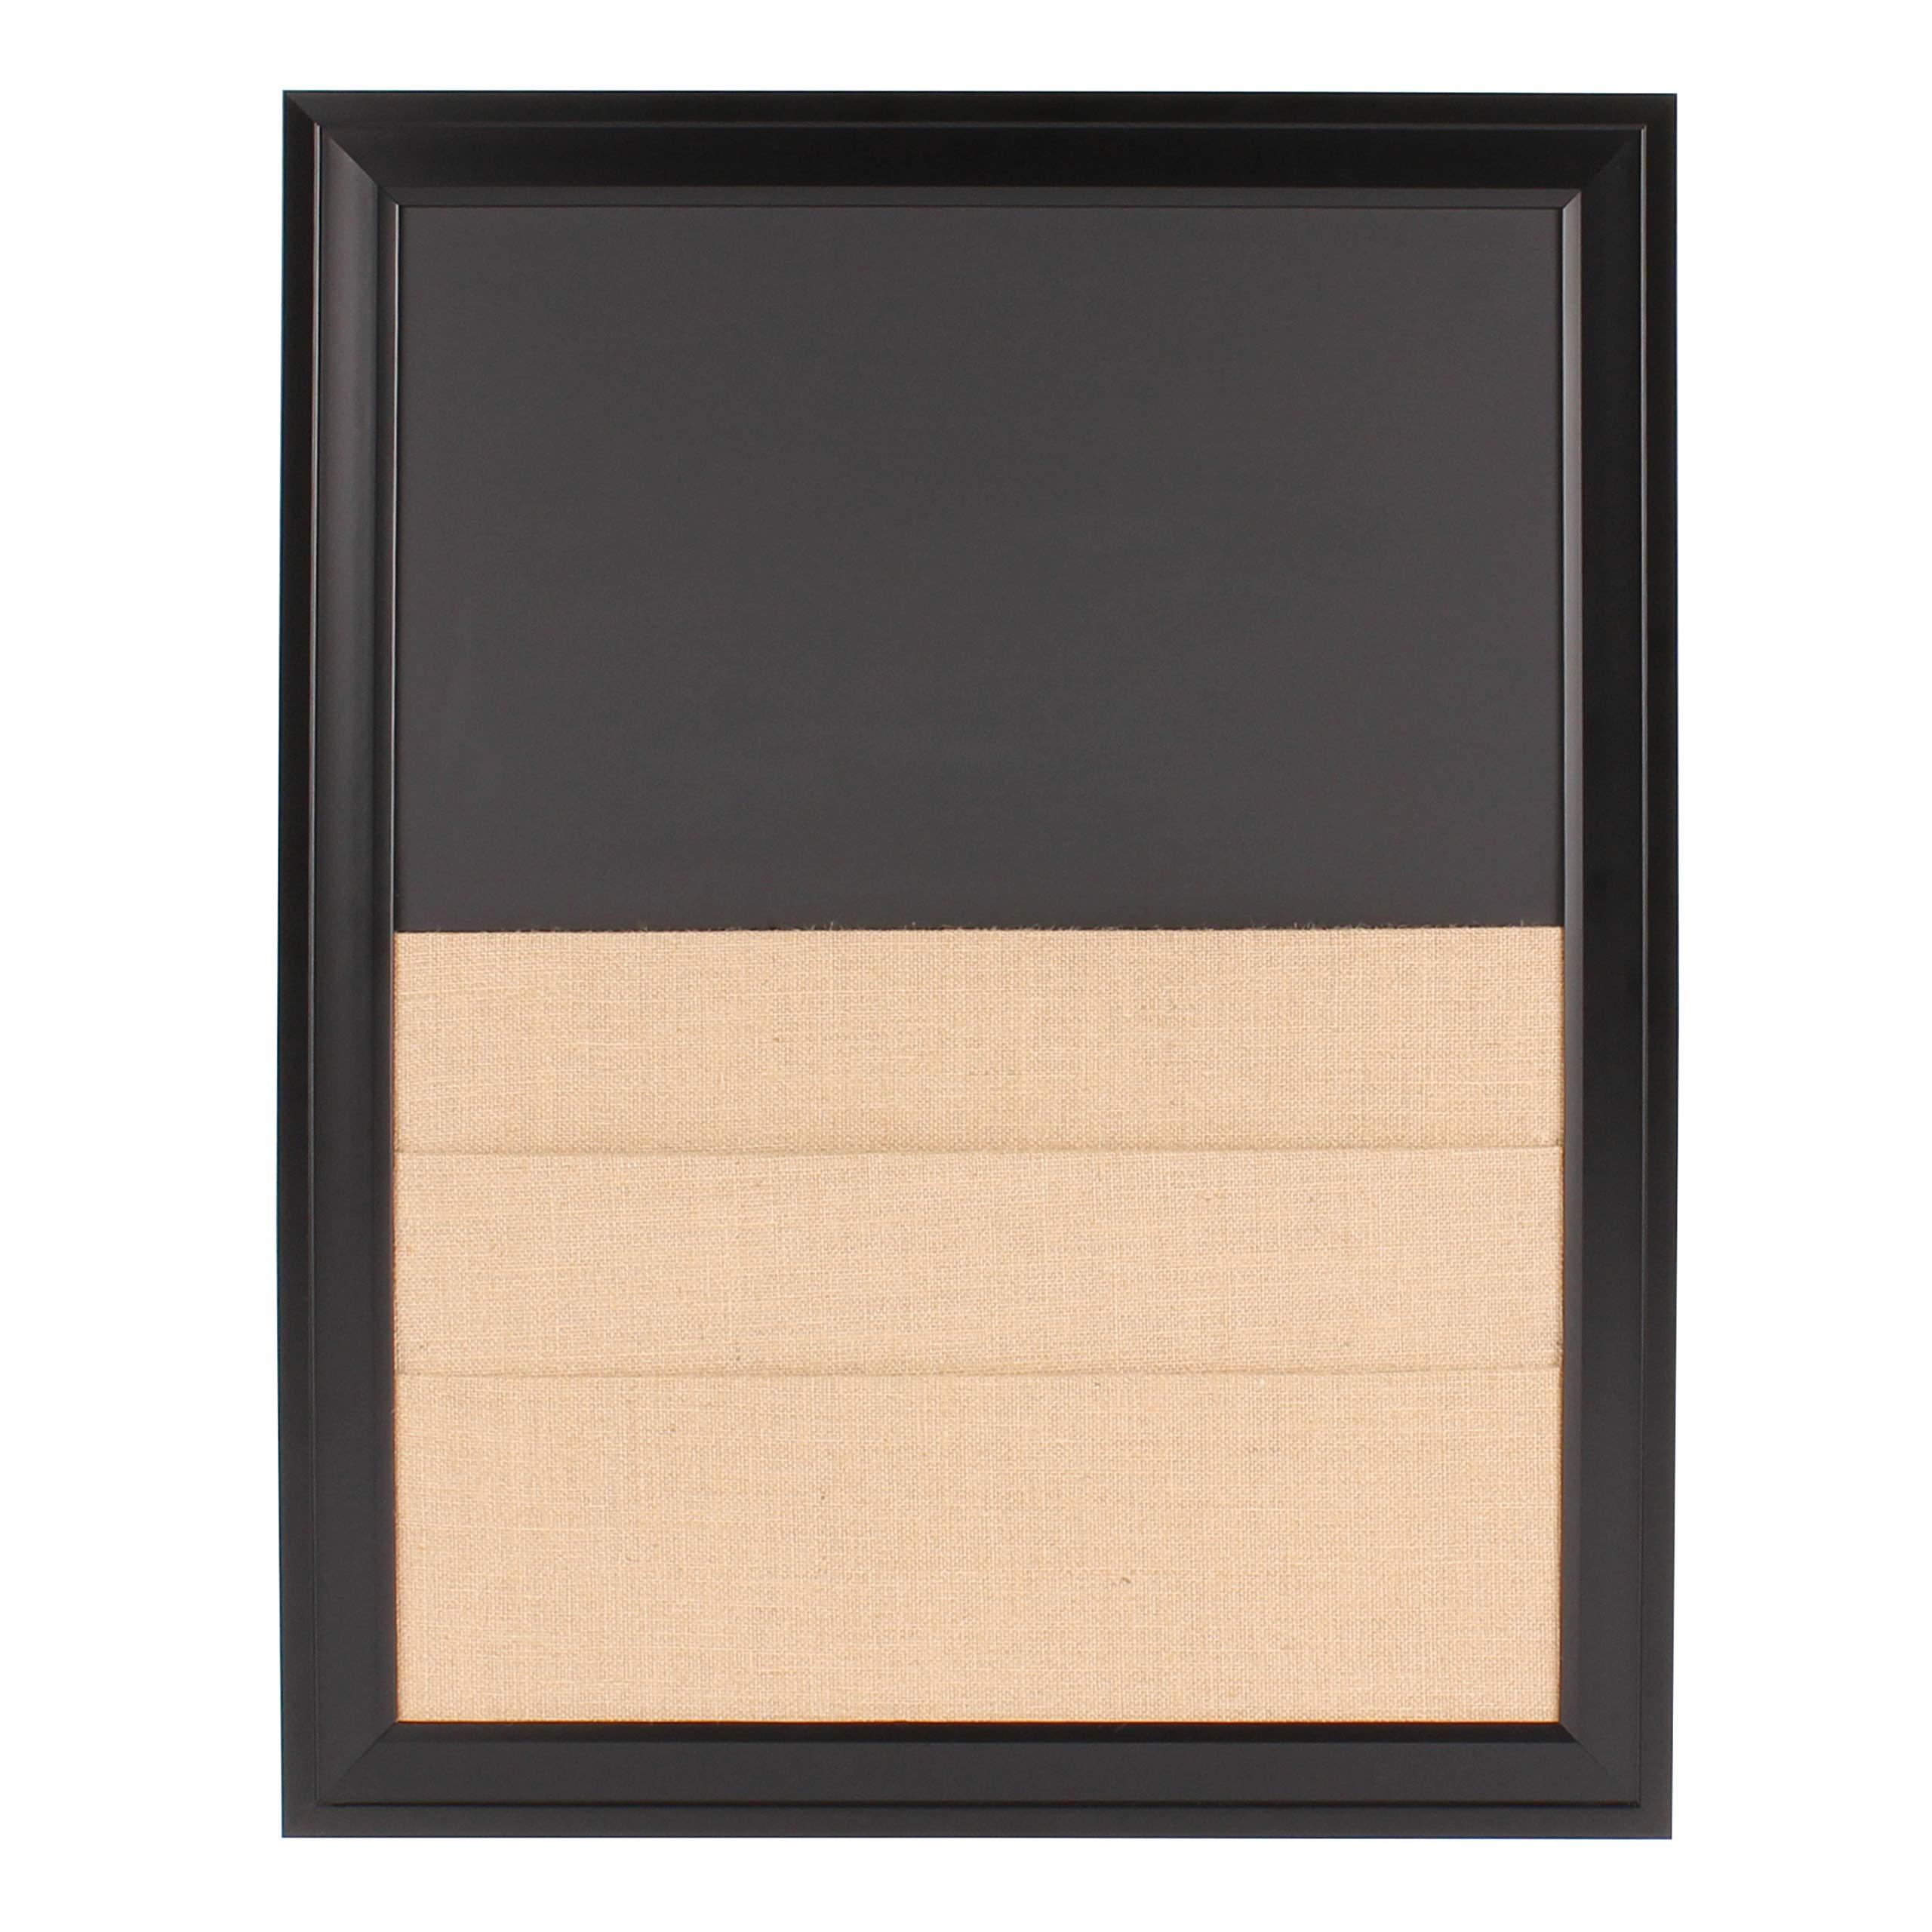 DesignOvation Bosc Framed Combination Magnetic Chalkboard and Burlap Pockets Wall Board, Black by DesignOvation